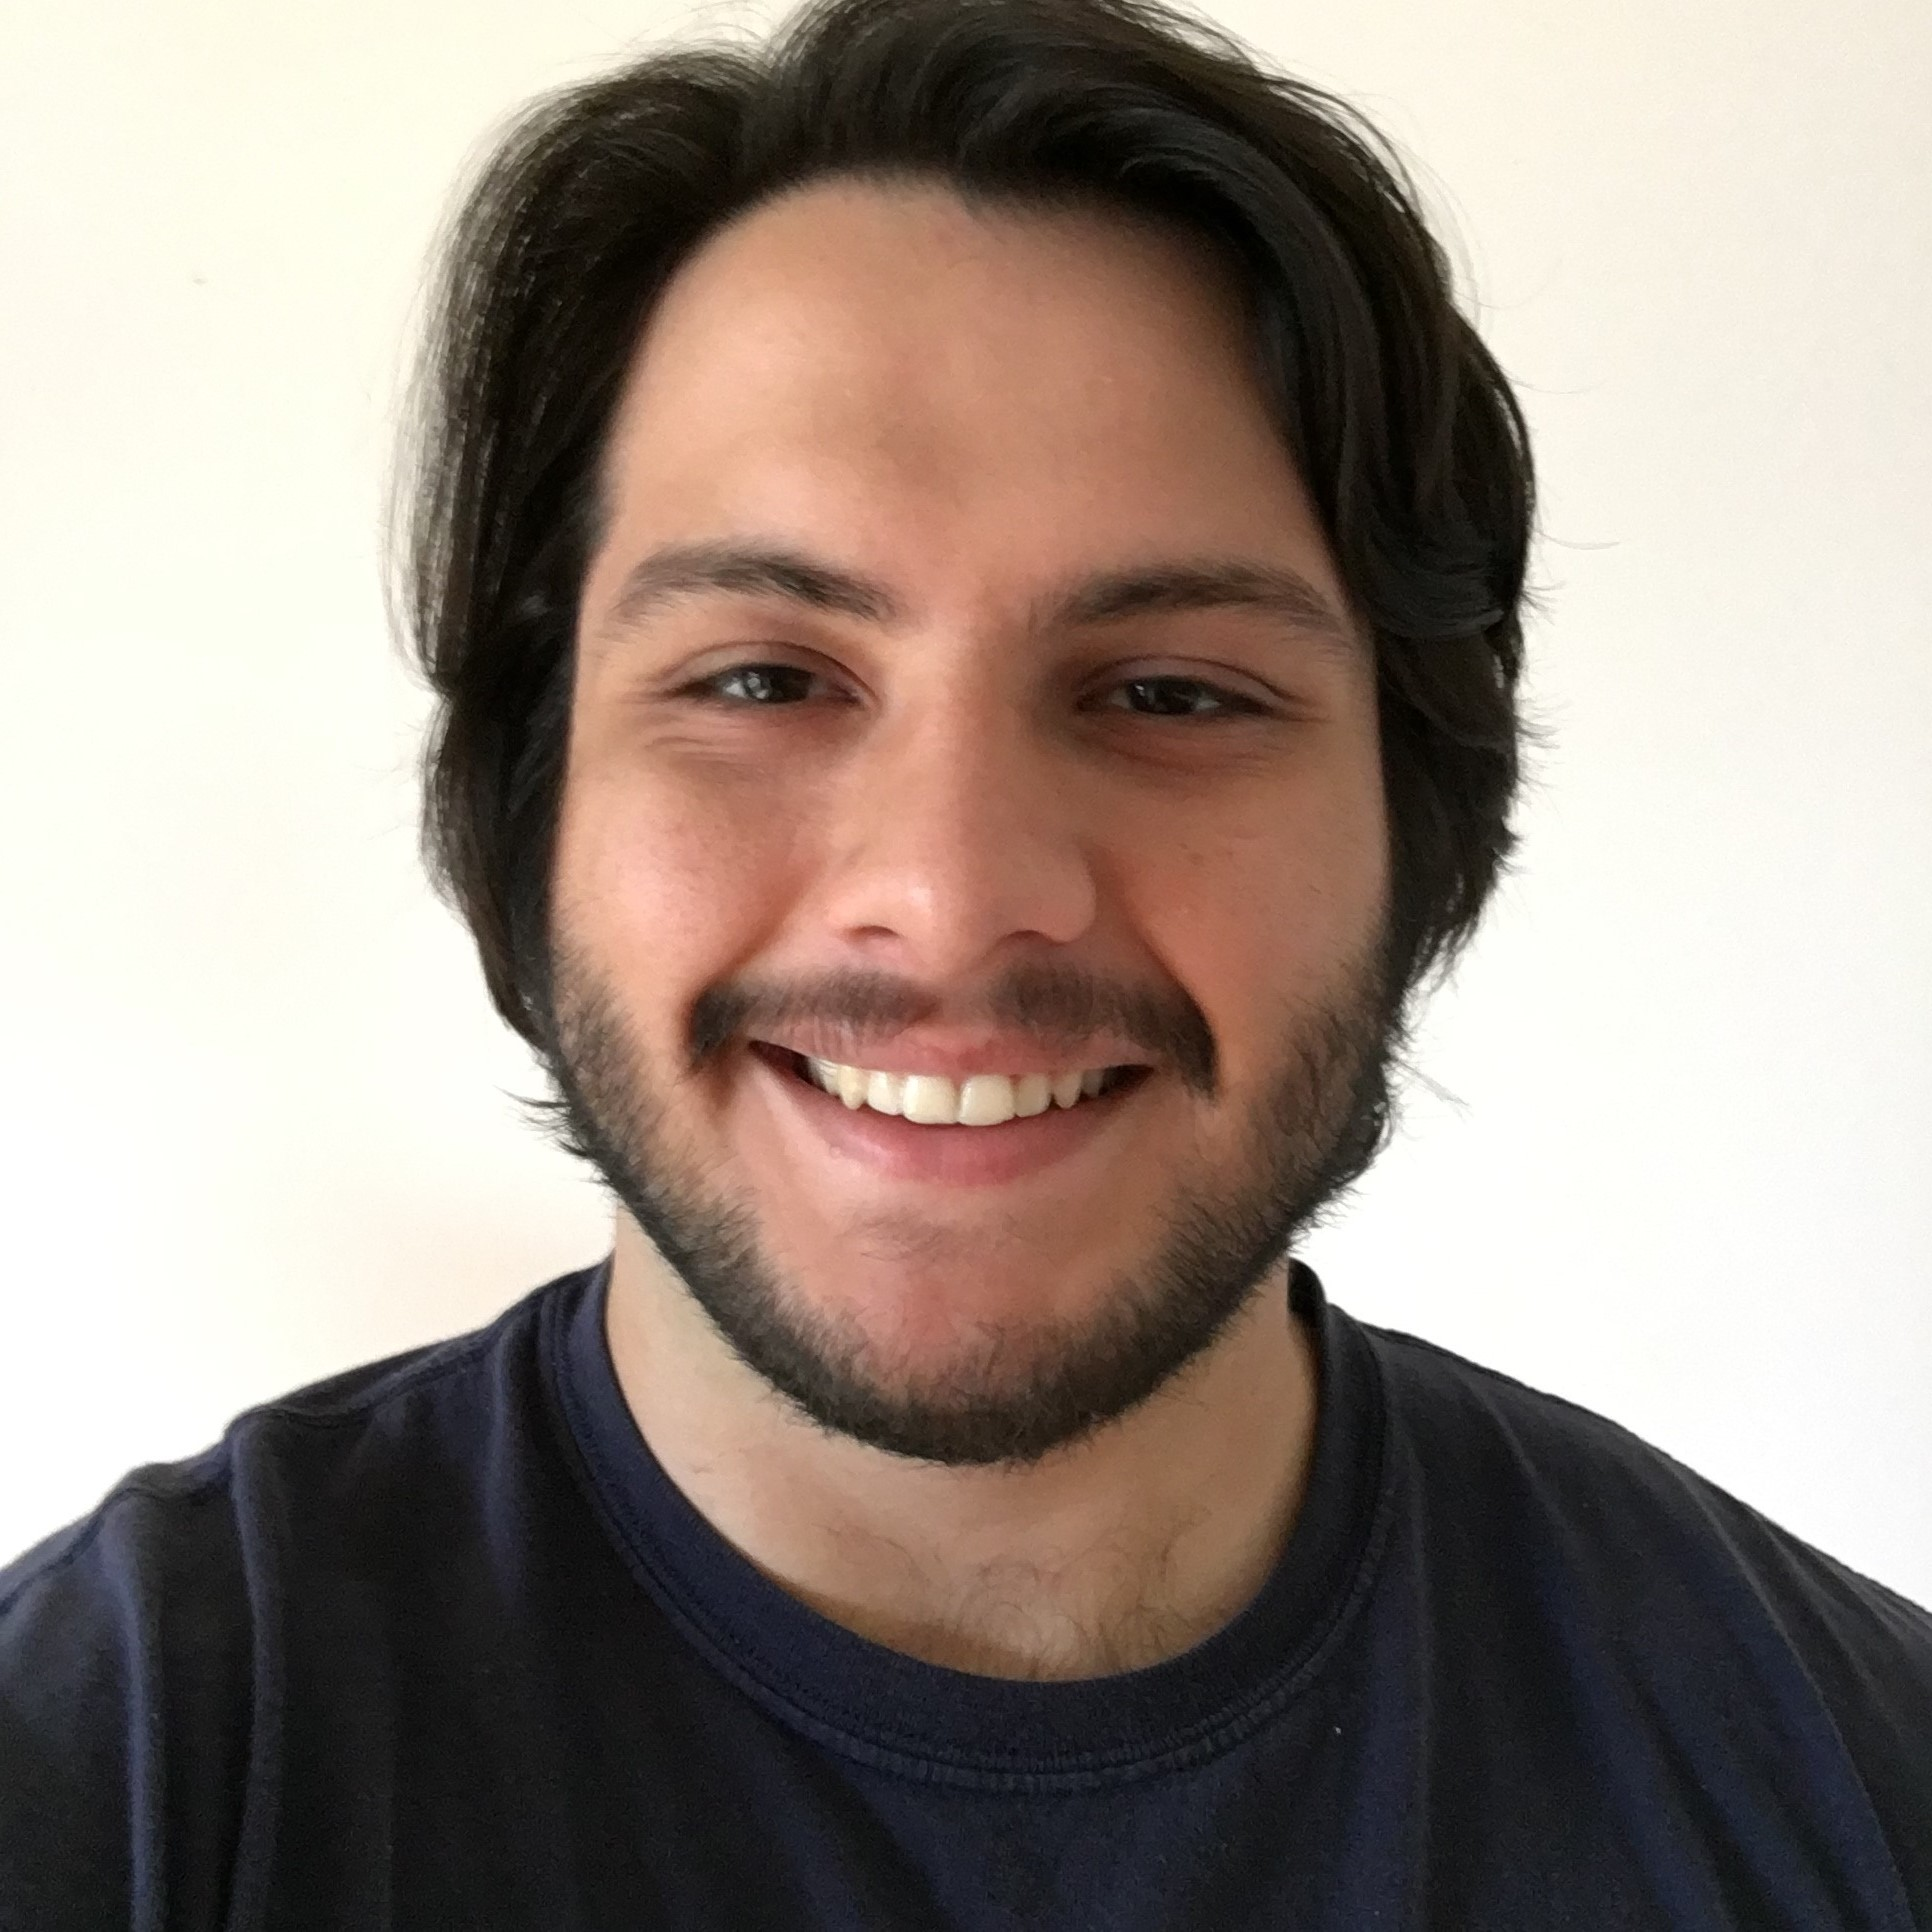 Christian Ornelas, Graduate Student